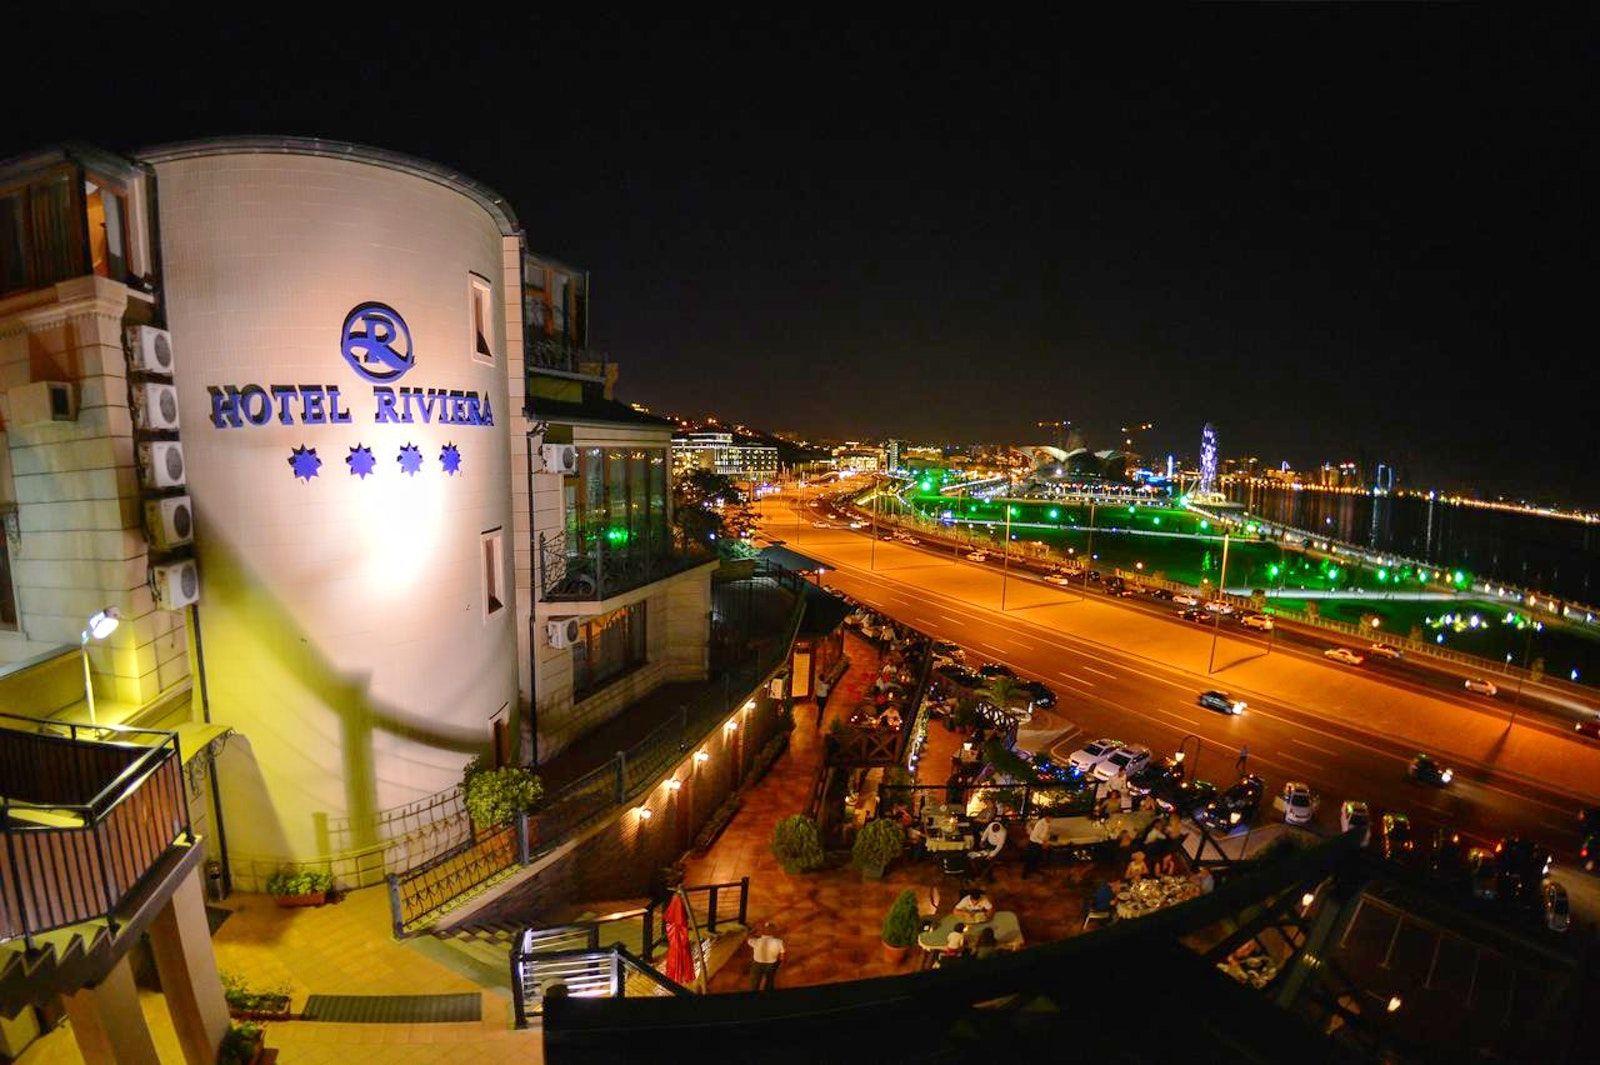 Restaurants In Baku With The Best City View Rivier